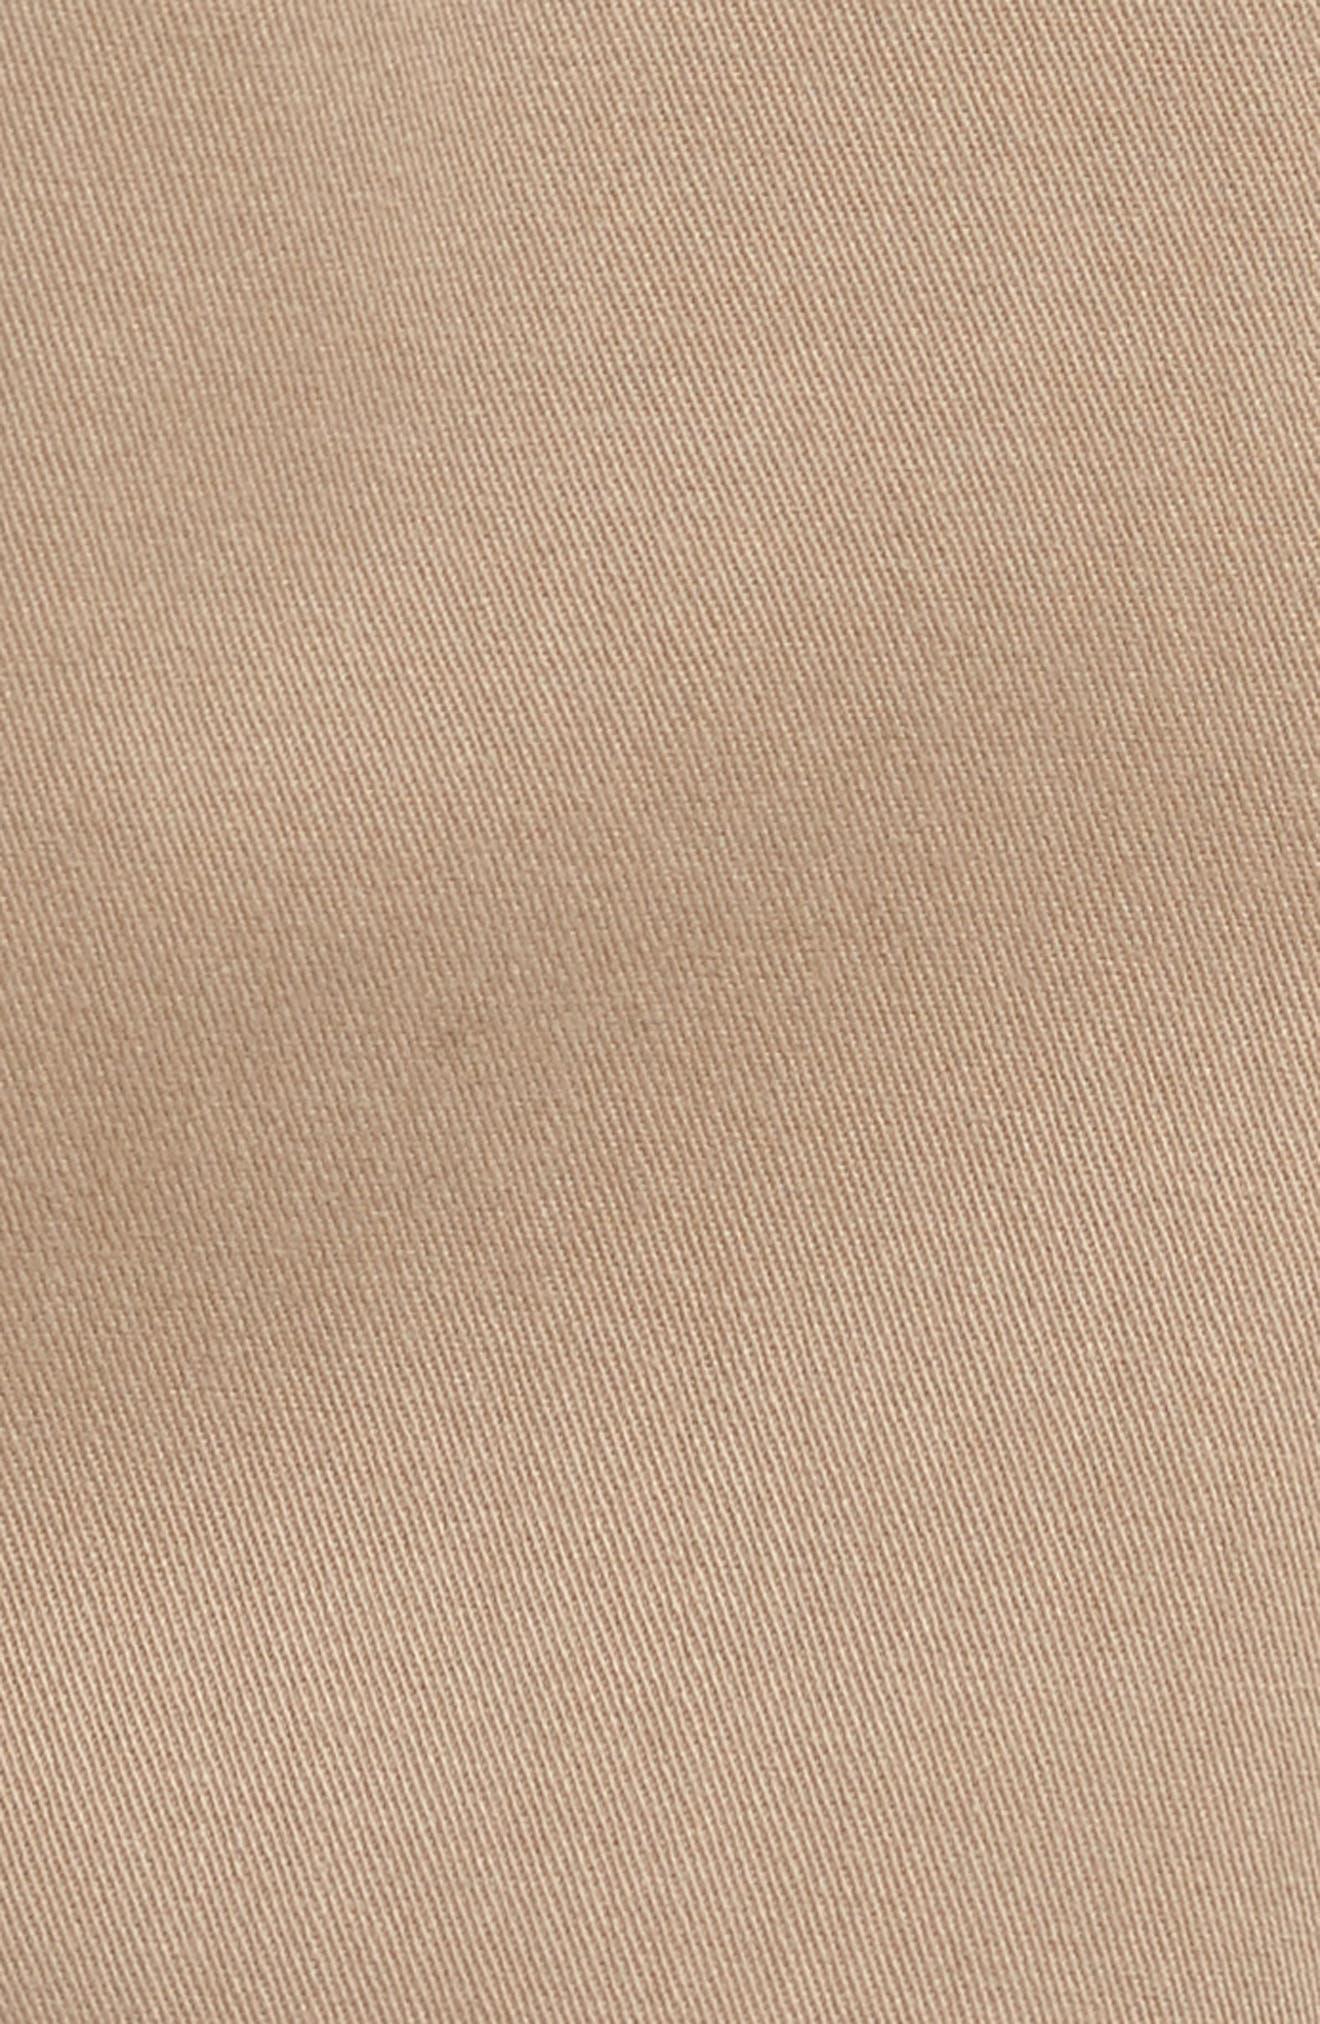 Blake Slim Fit Jeans,                             Alternate thumbnail 5, color,                             Sandman